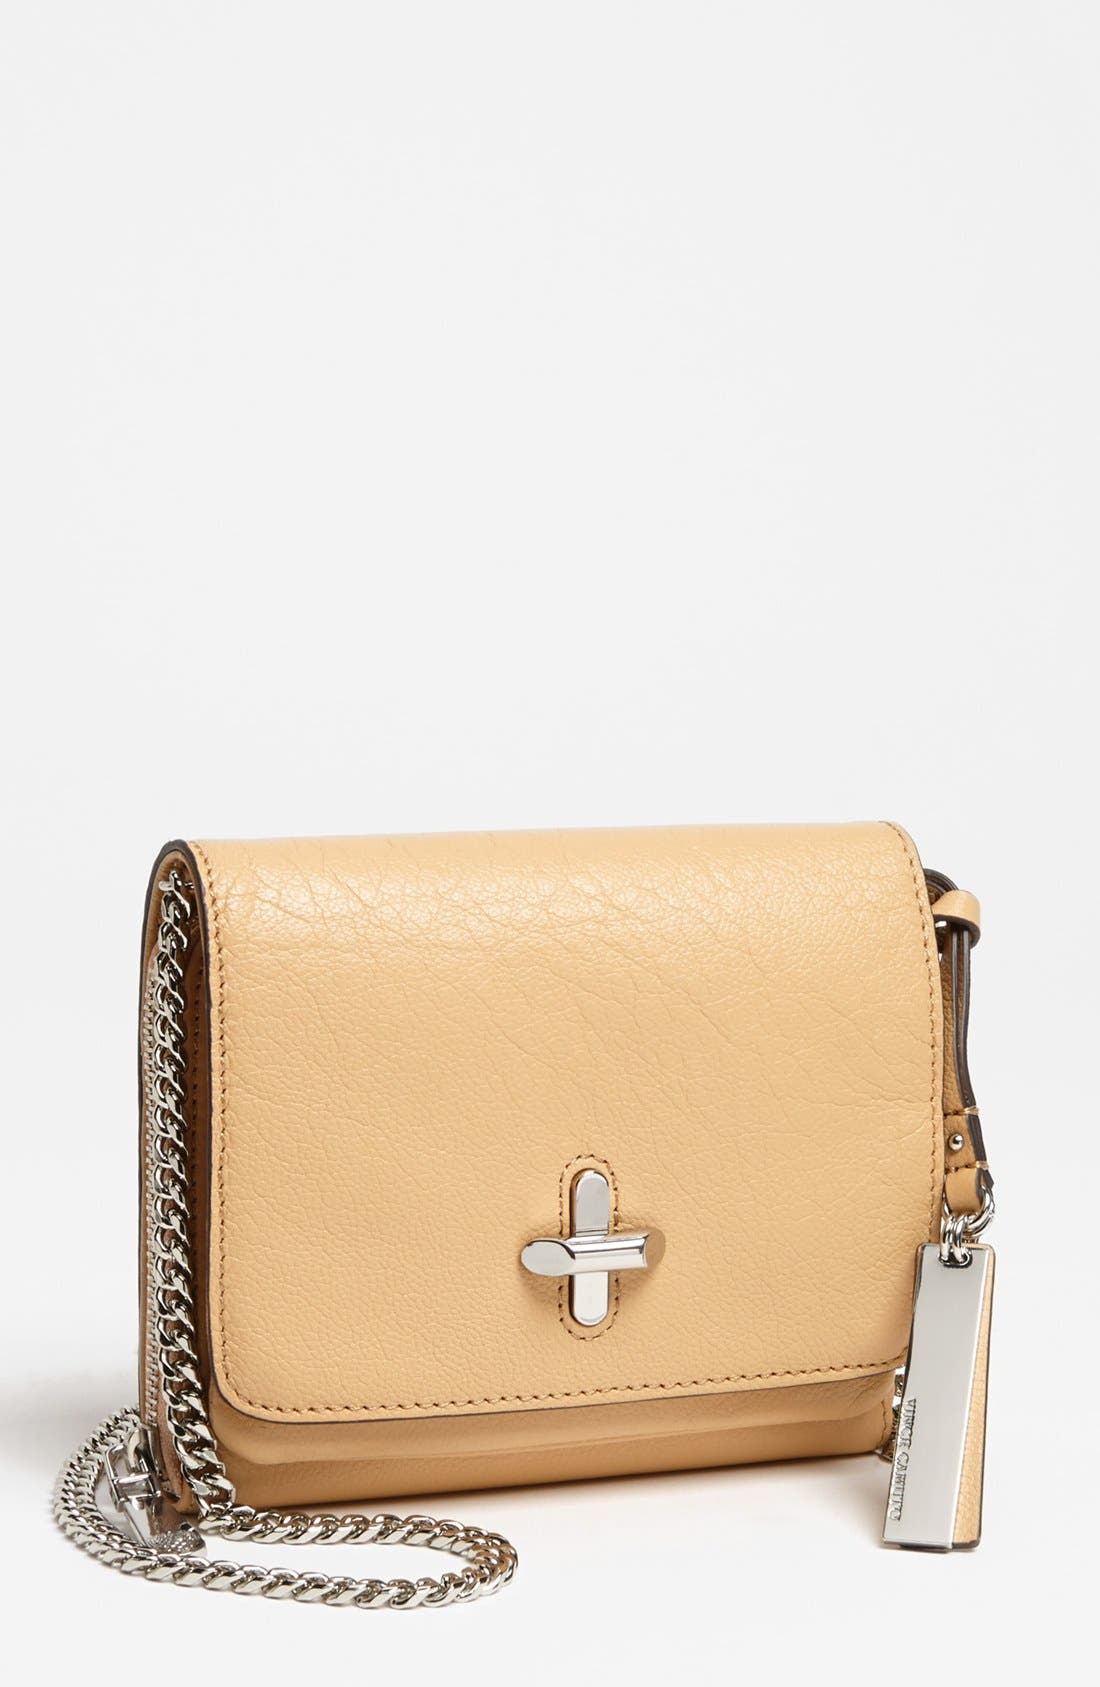 Main Image - Vince Camuto 'Lexi' Crossbody Bag